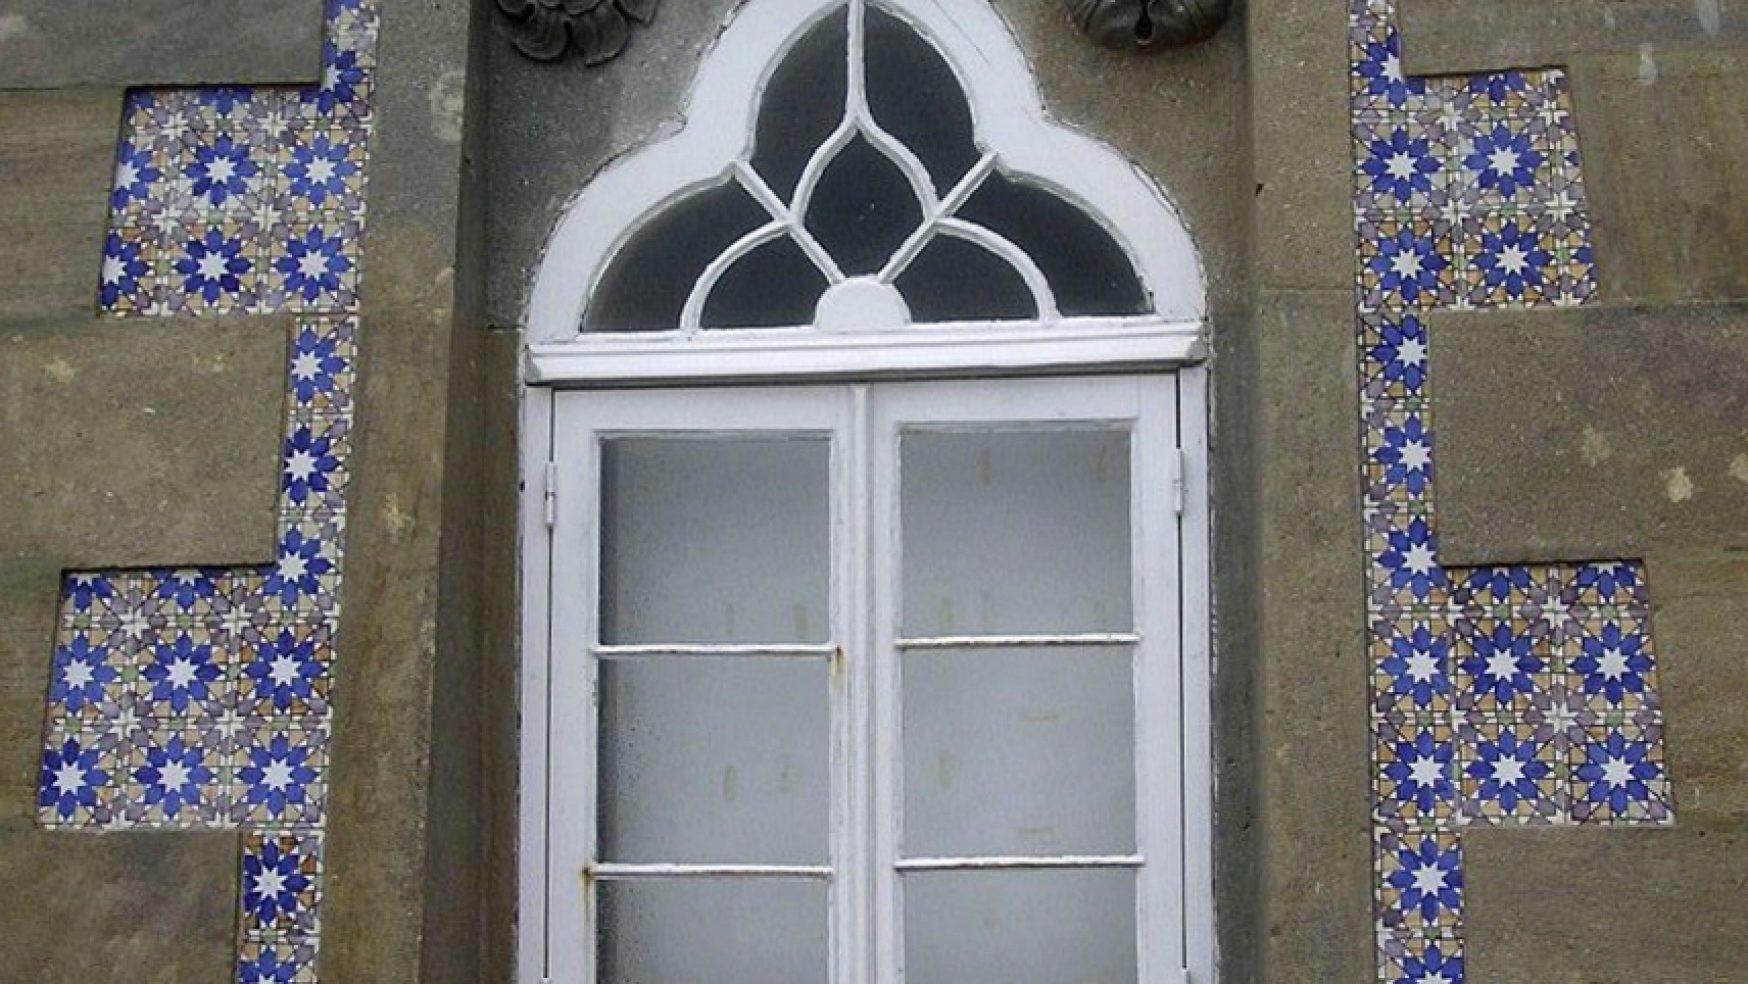 The New Johari Window #12. Quadrant I: The Original Johari Window